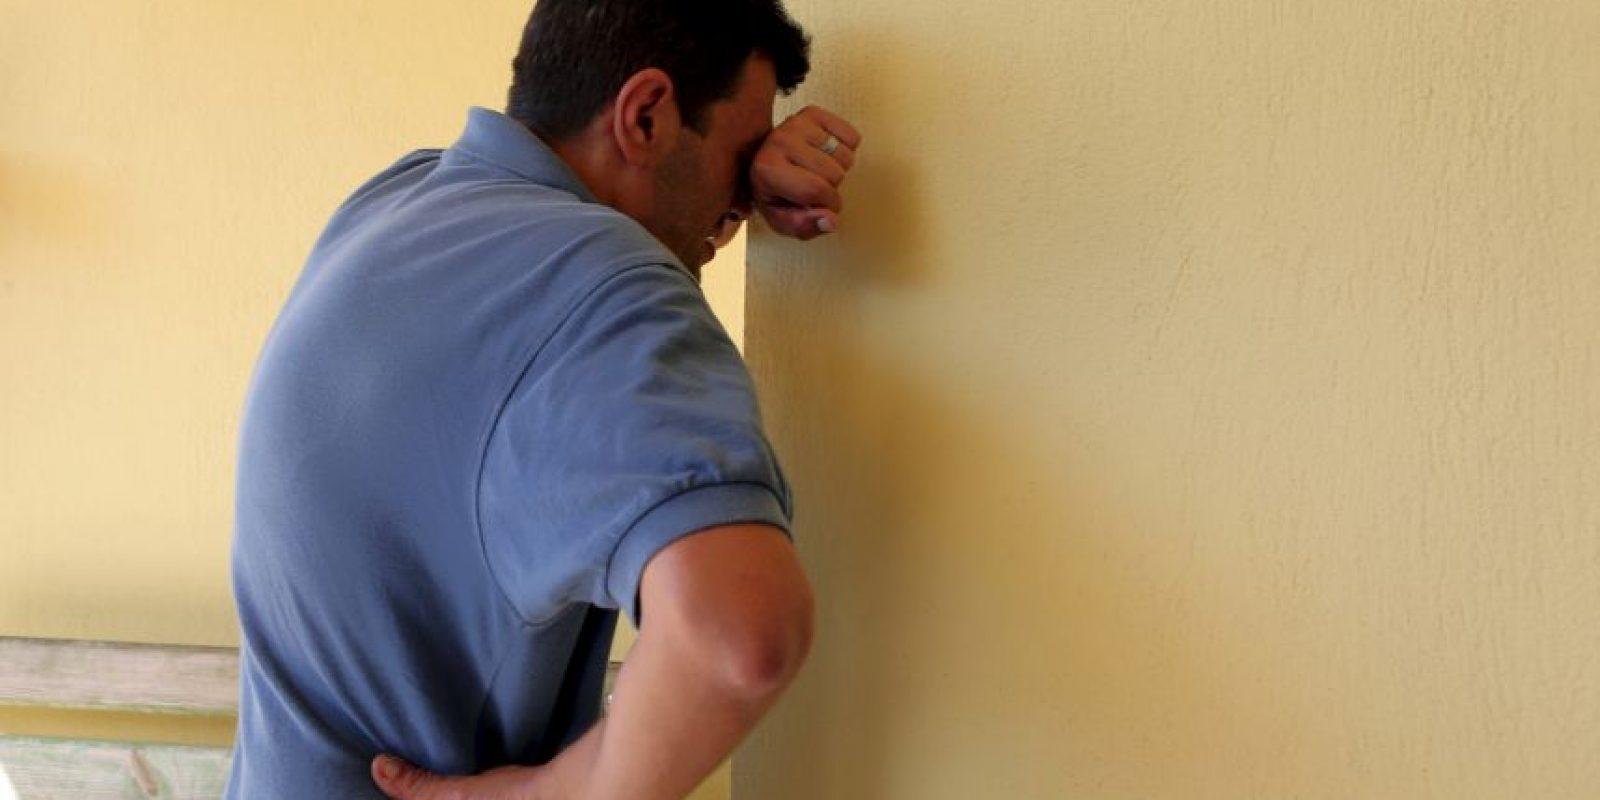 Su padre Abdullah Kurdi envió un mensaje a favor de los refugiados. Foto:AP